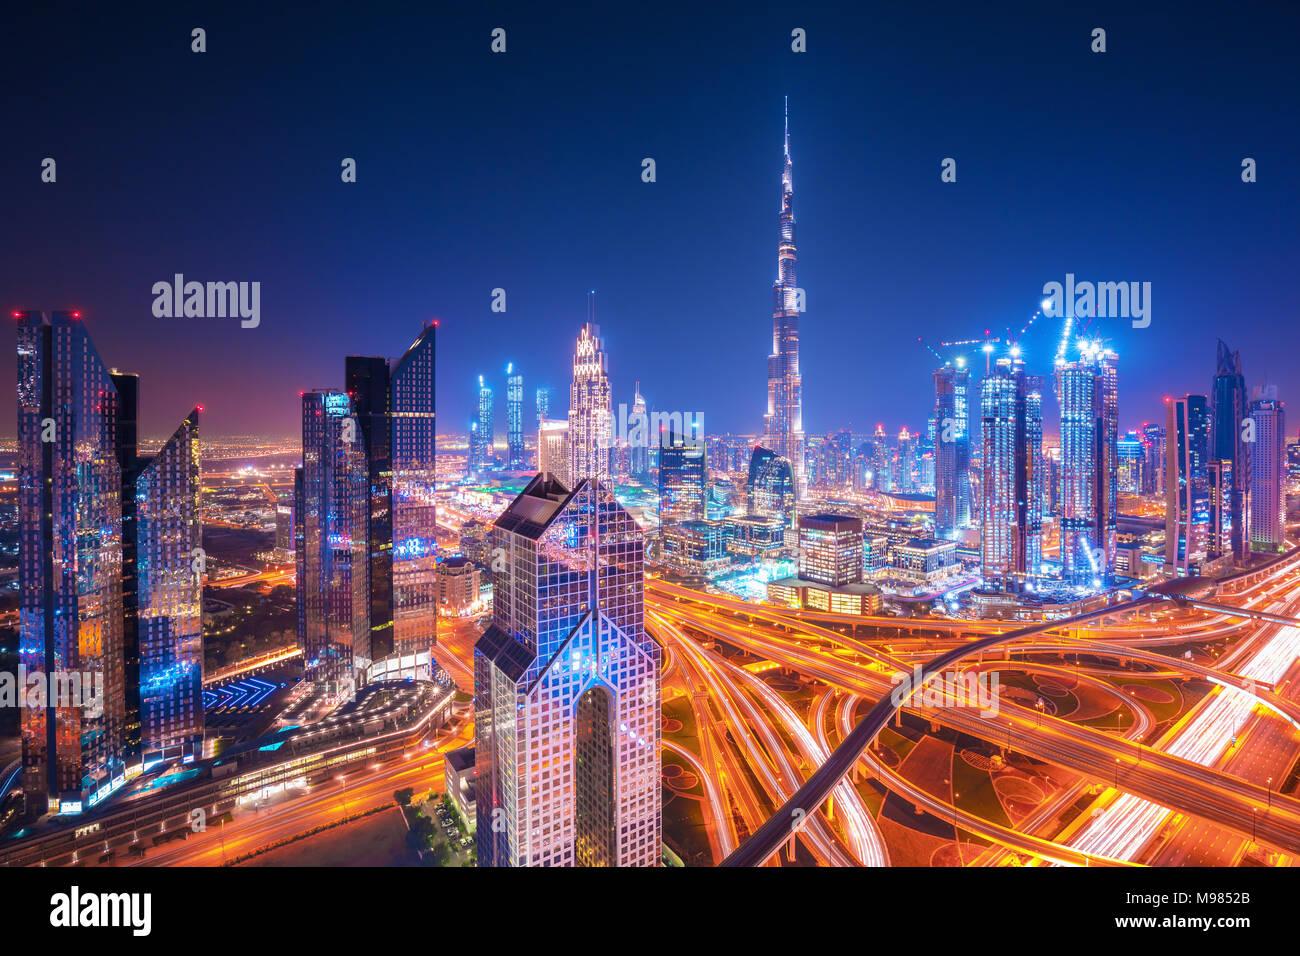 Dubai skyline at sunset with beautiful city center lights and Sheikh Zayed road traffic, Dubai, United Arab Emirates - Stock Image